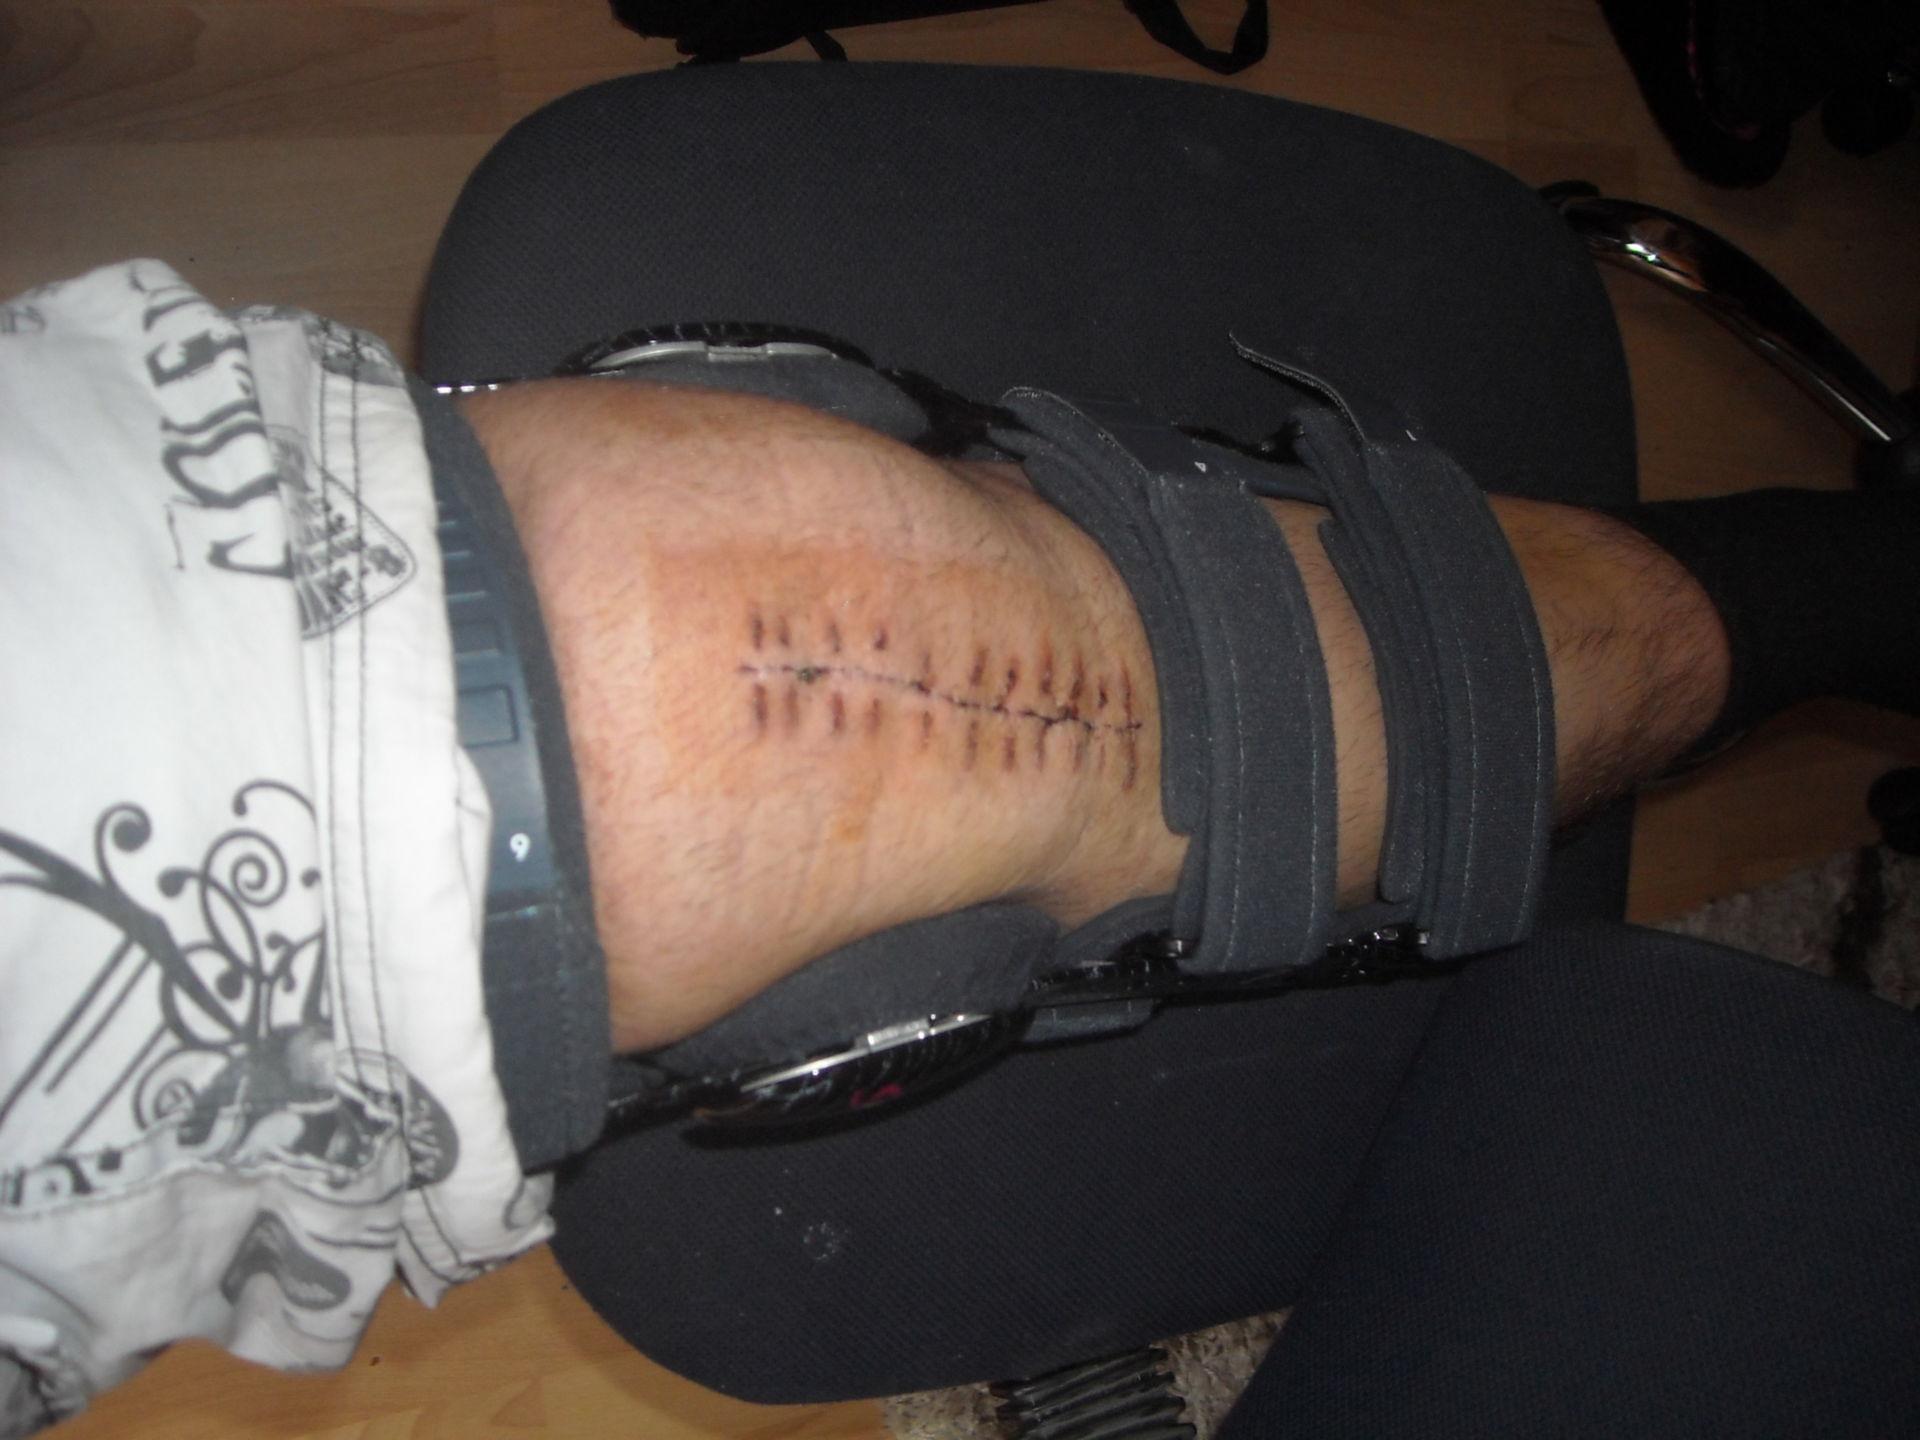 Aftertreatment of a leg surgery